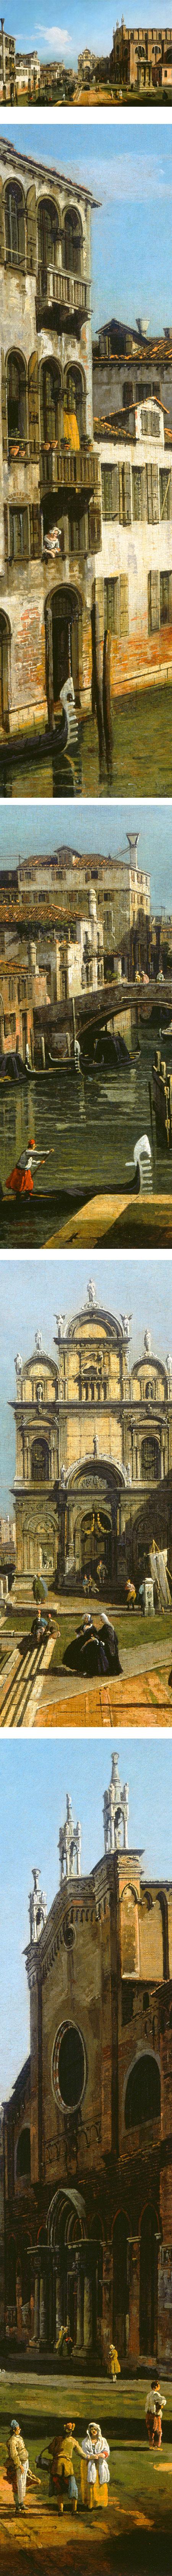 The Campo di SS. Giovanni e Paolo, Venice; Bernardo Bellotto